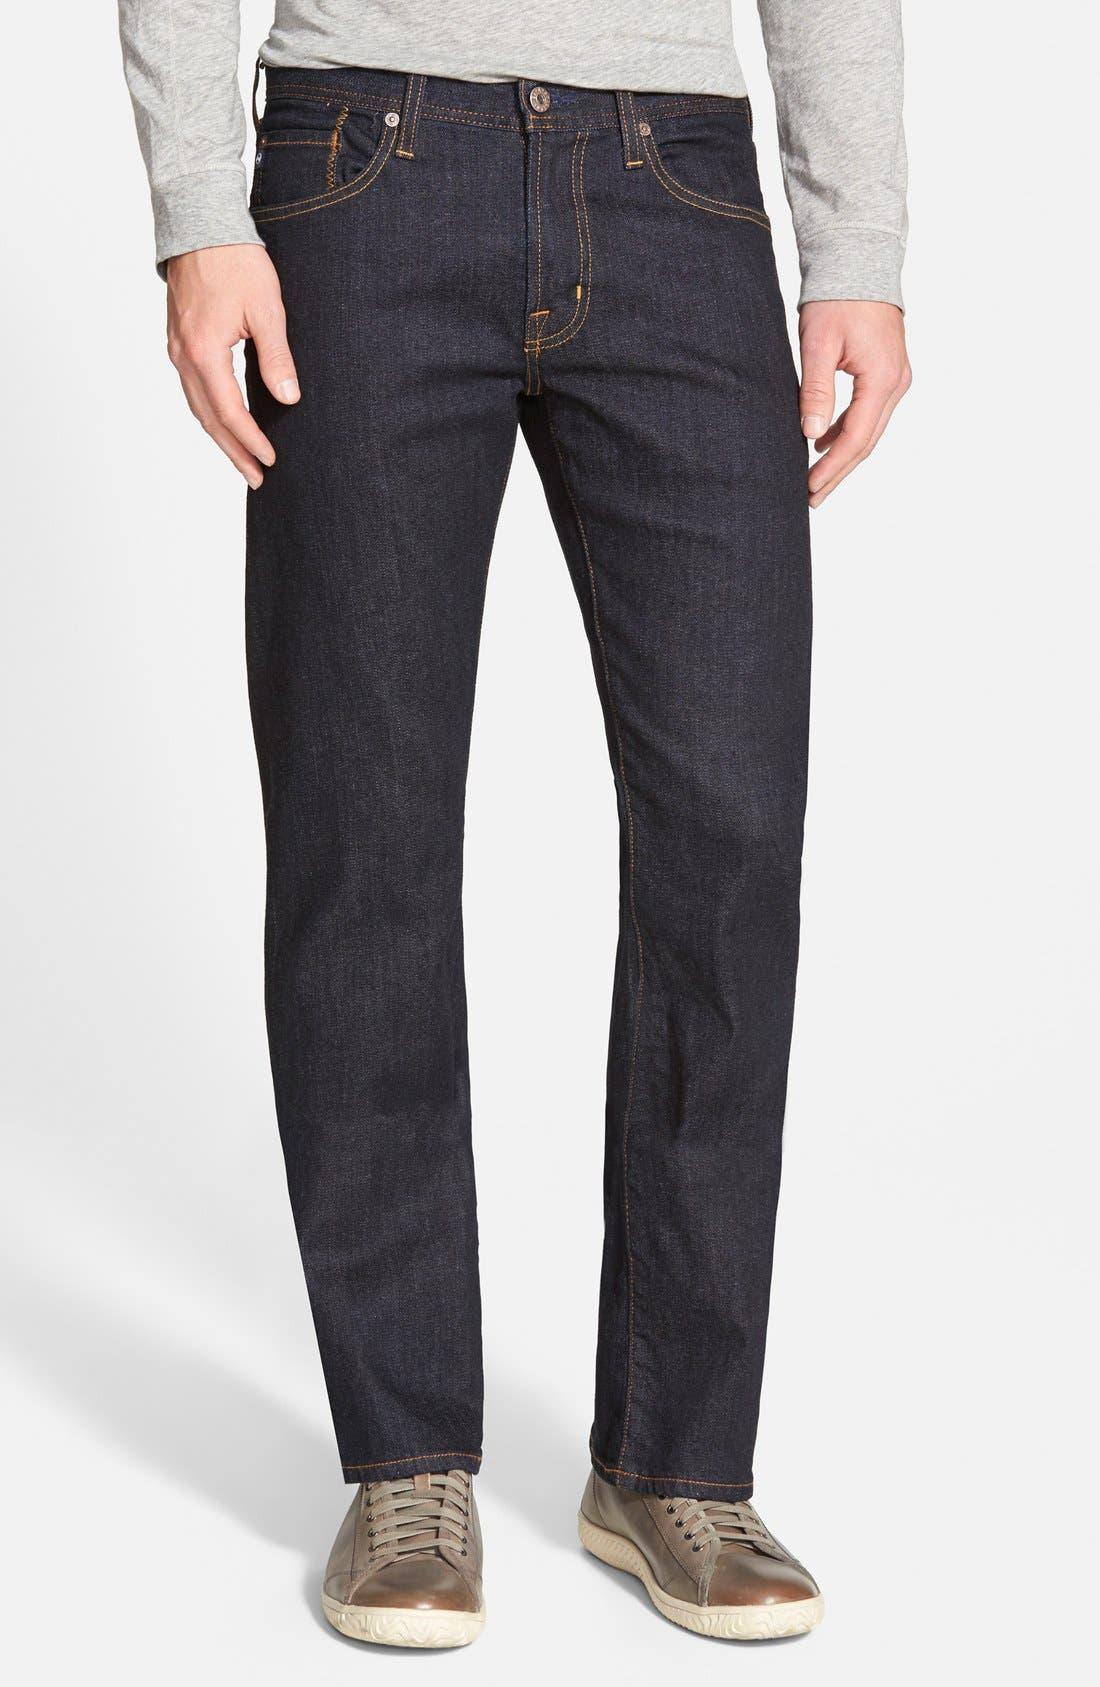 Protégé Straight Leg Jeans,                         Main,                         color, 461